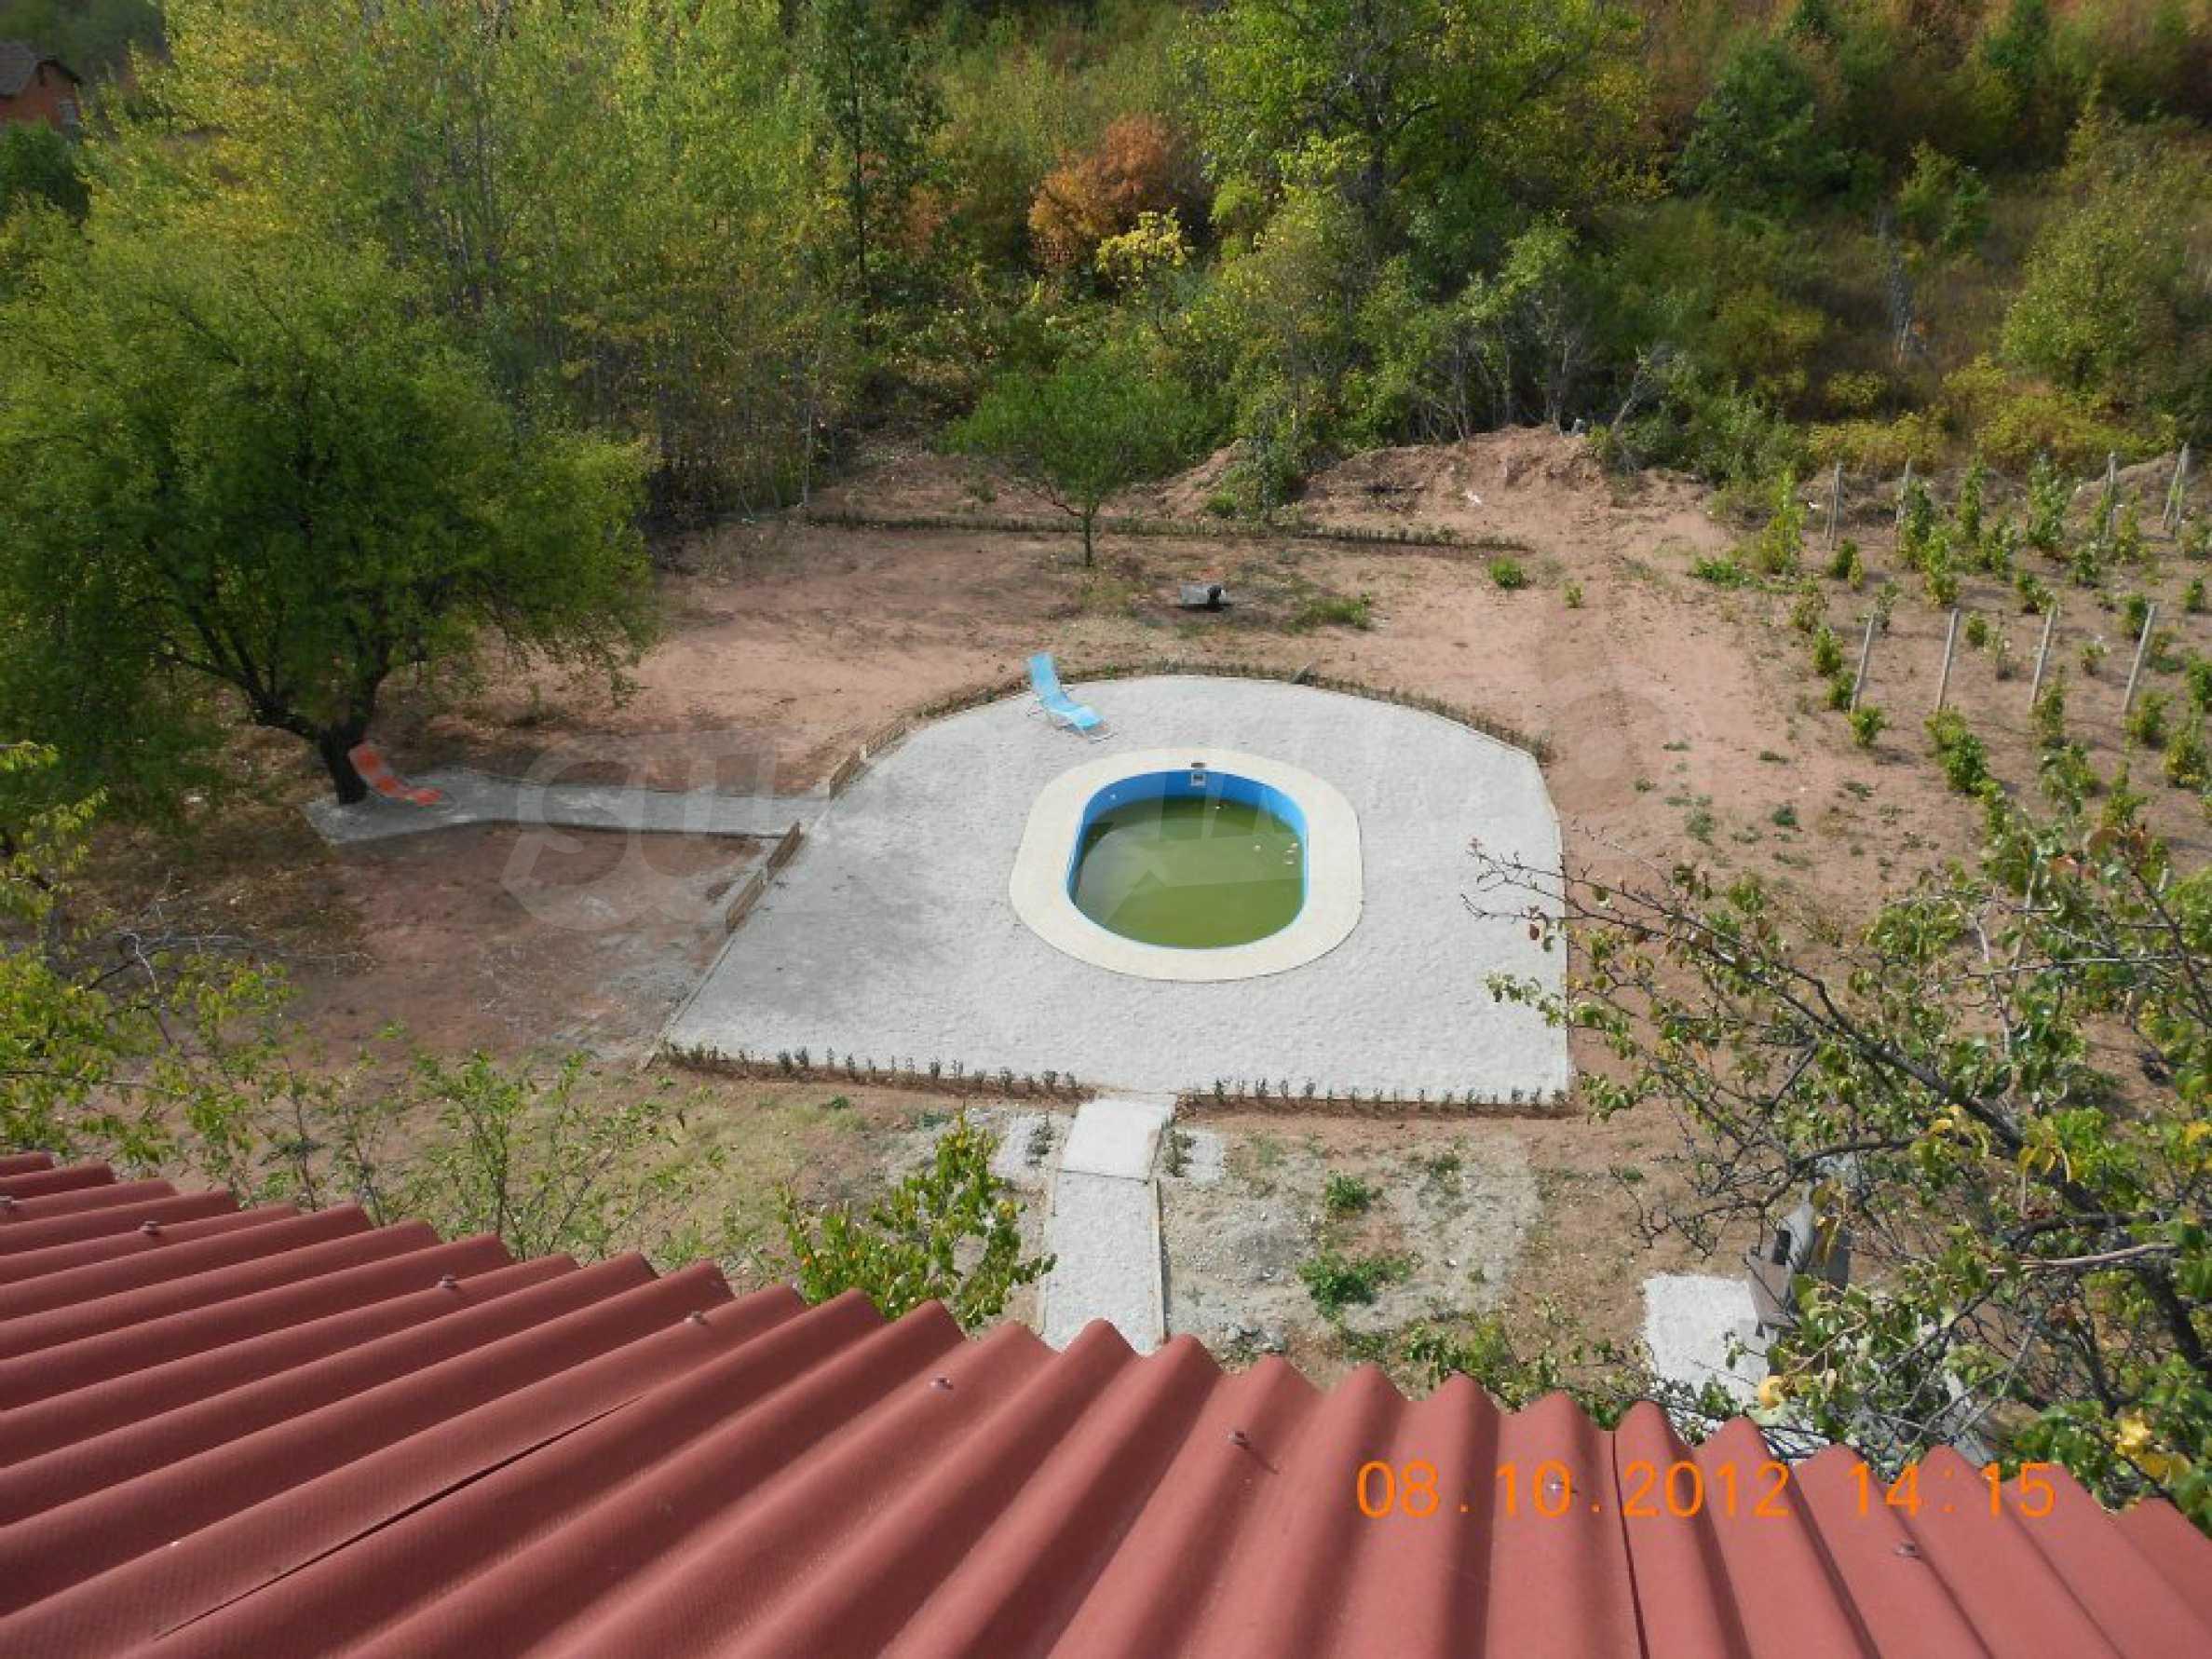 3-storey villa with garden and small plunge pool near Belogradchik 28